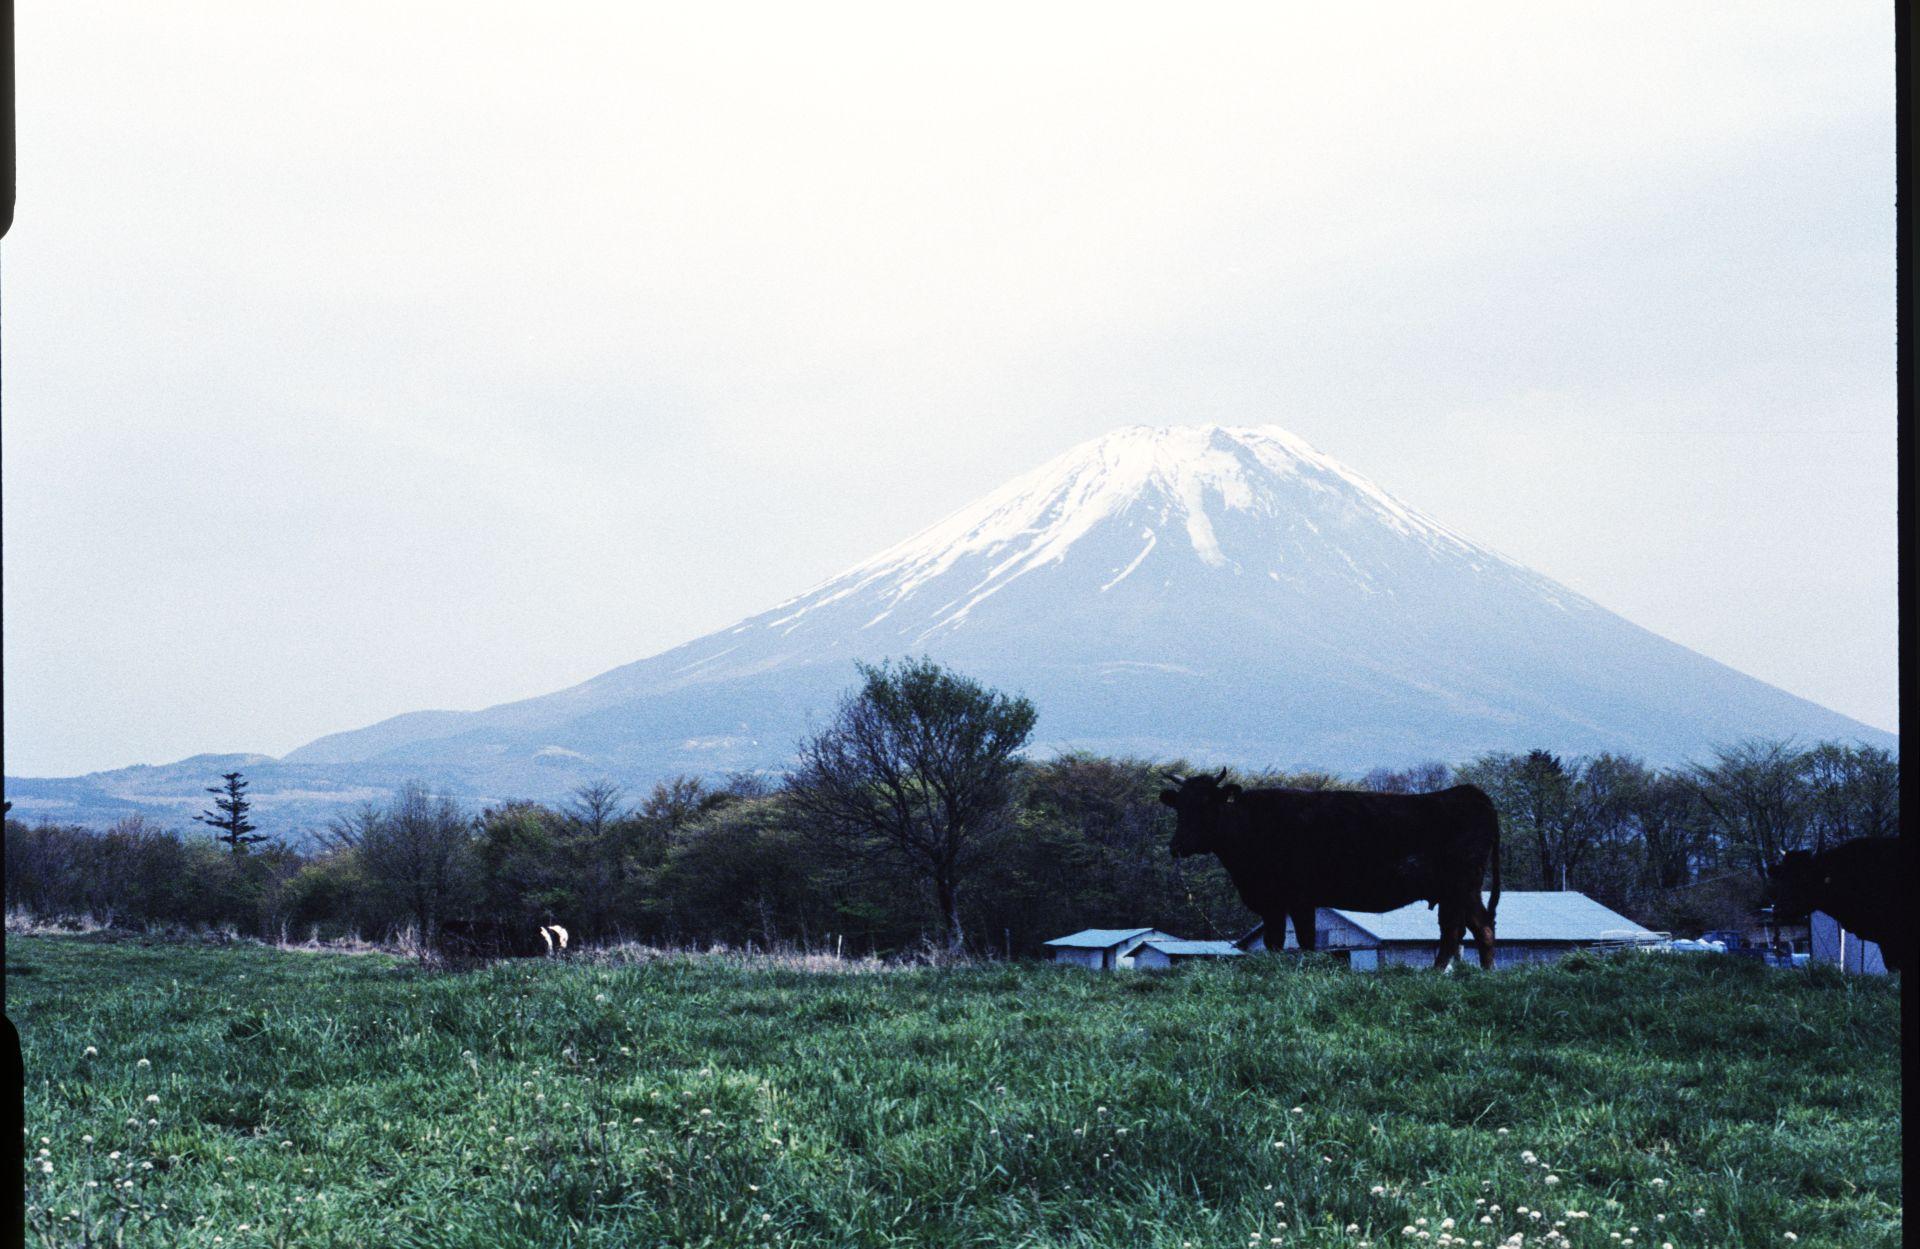 f:id:yasuo_ssi:20201016003441j:plain